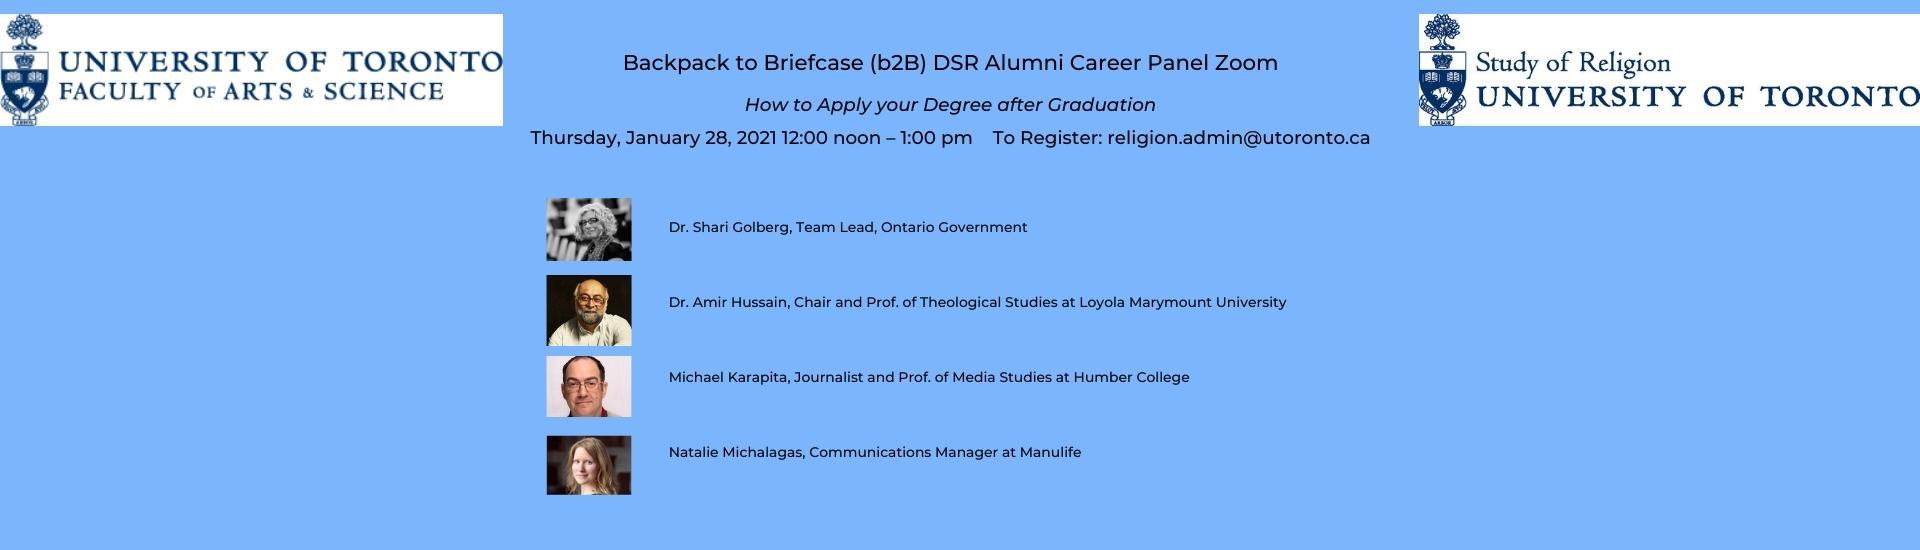 b2B DSR Alumni Career Panel